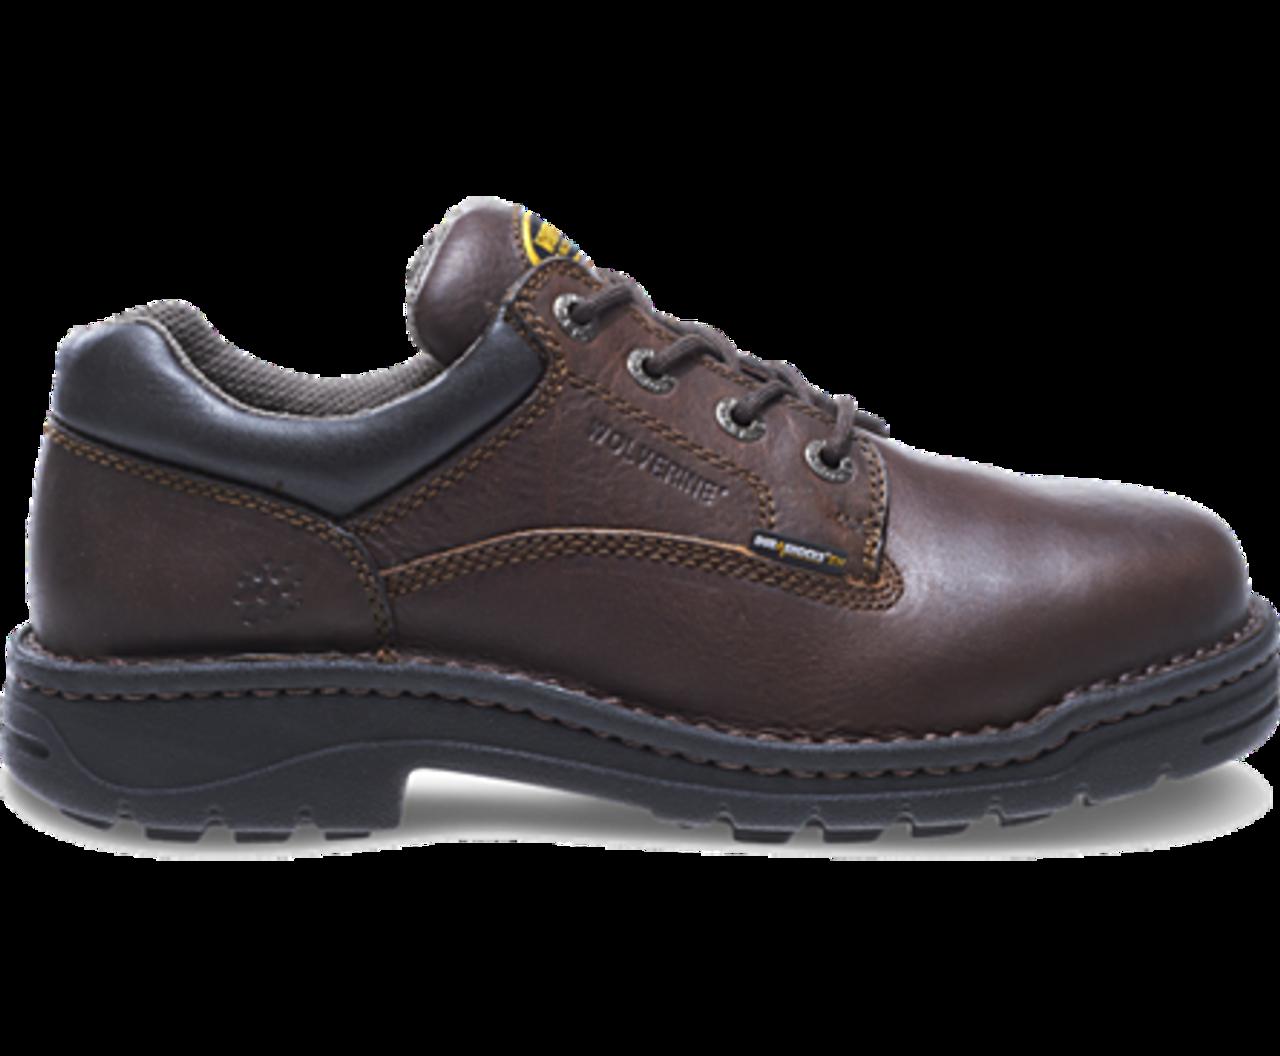 d193fa7cd6f7 Wolverine W04373 Mens Exert DuraShocks® Steel-Toe Opanka Oxford Work Shoe